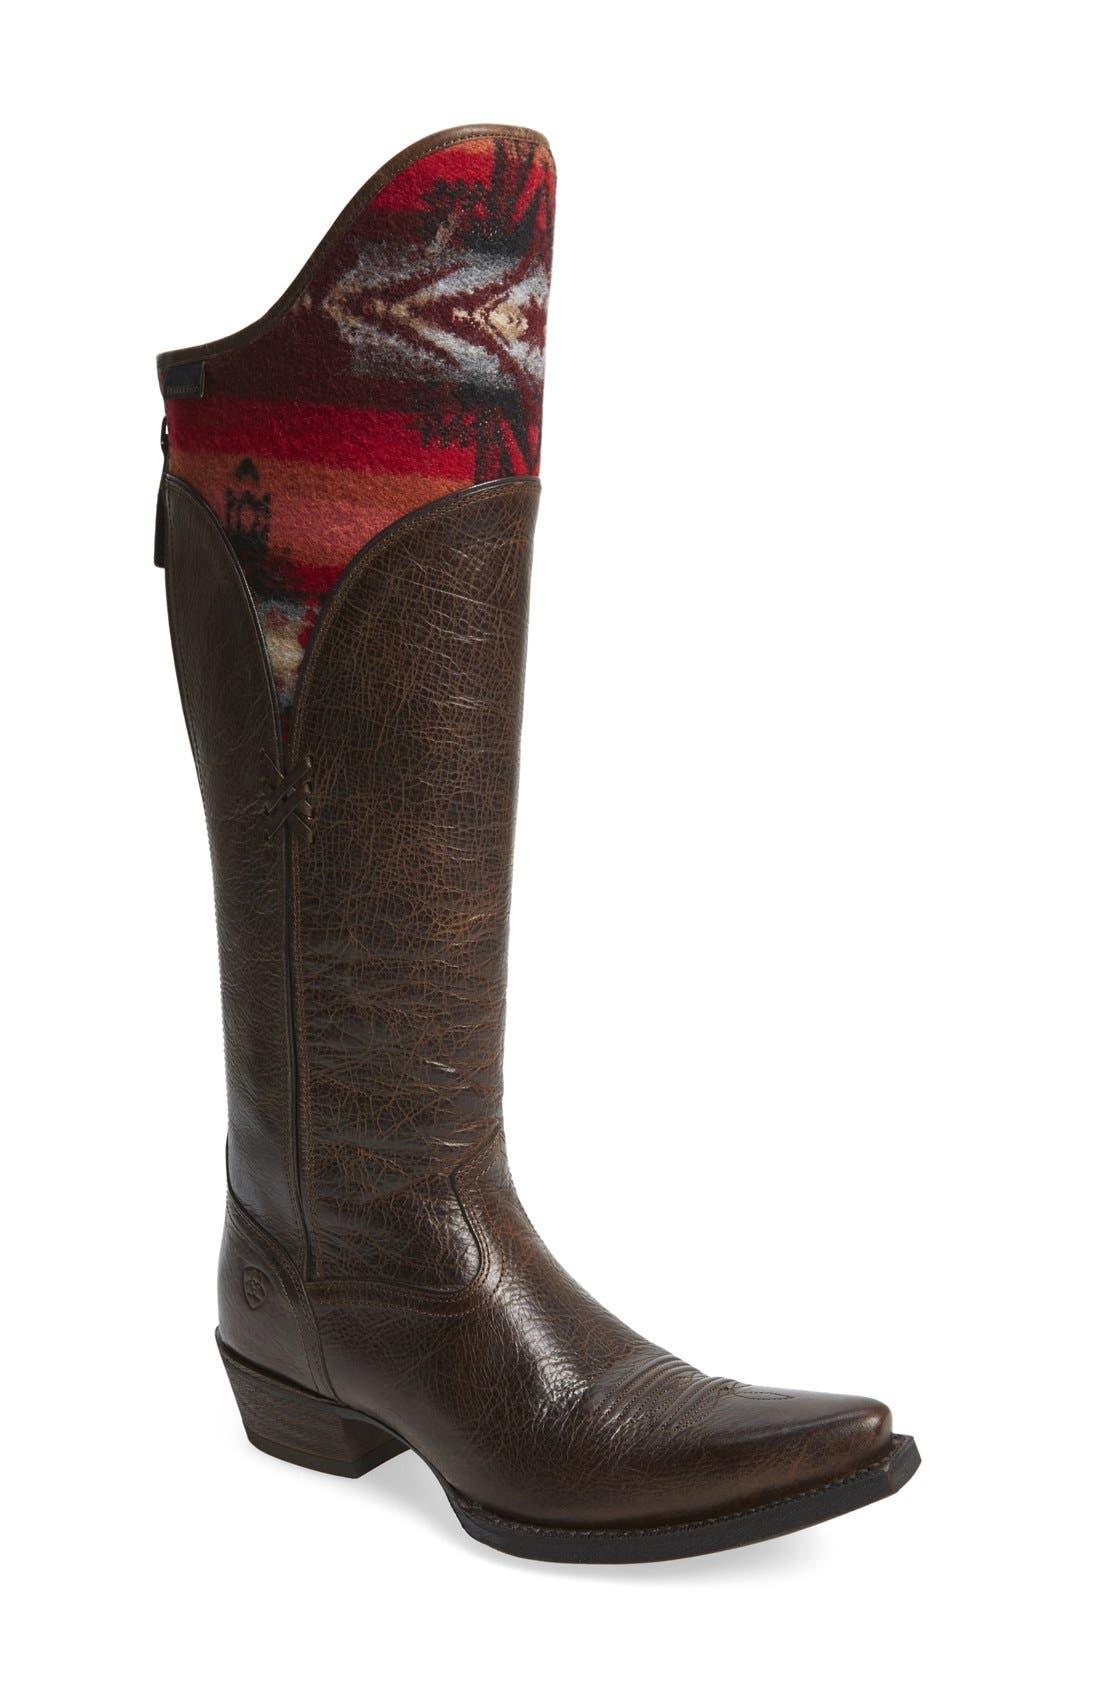 Main Image - Ariat 'Caldera' Western Boot (Women)